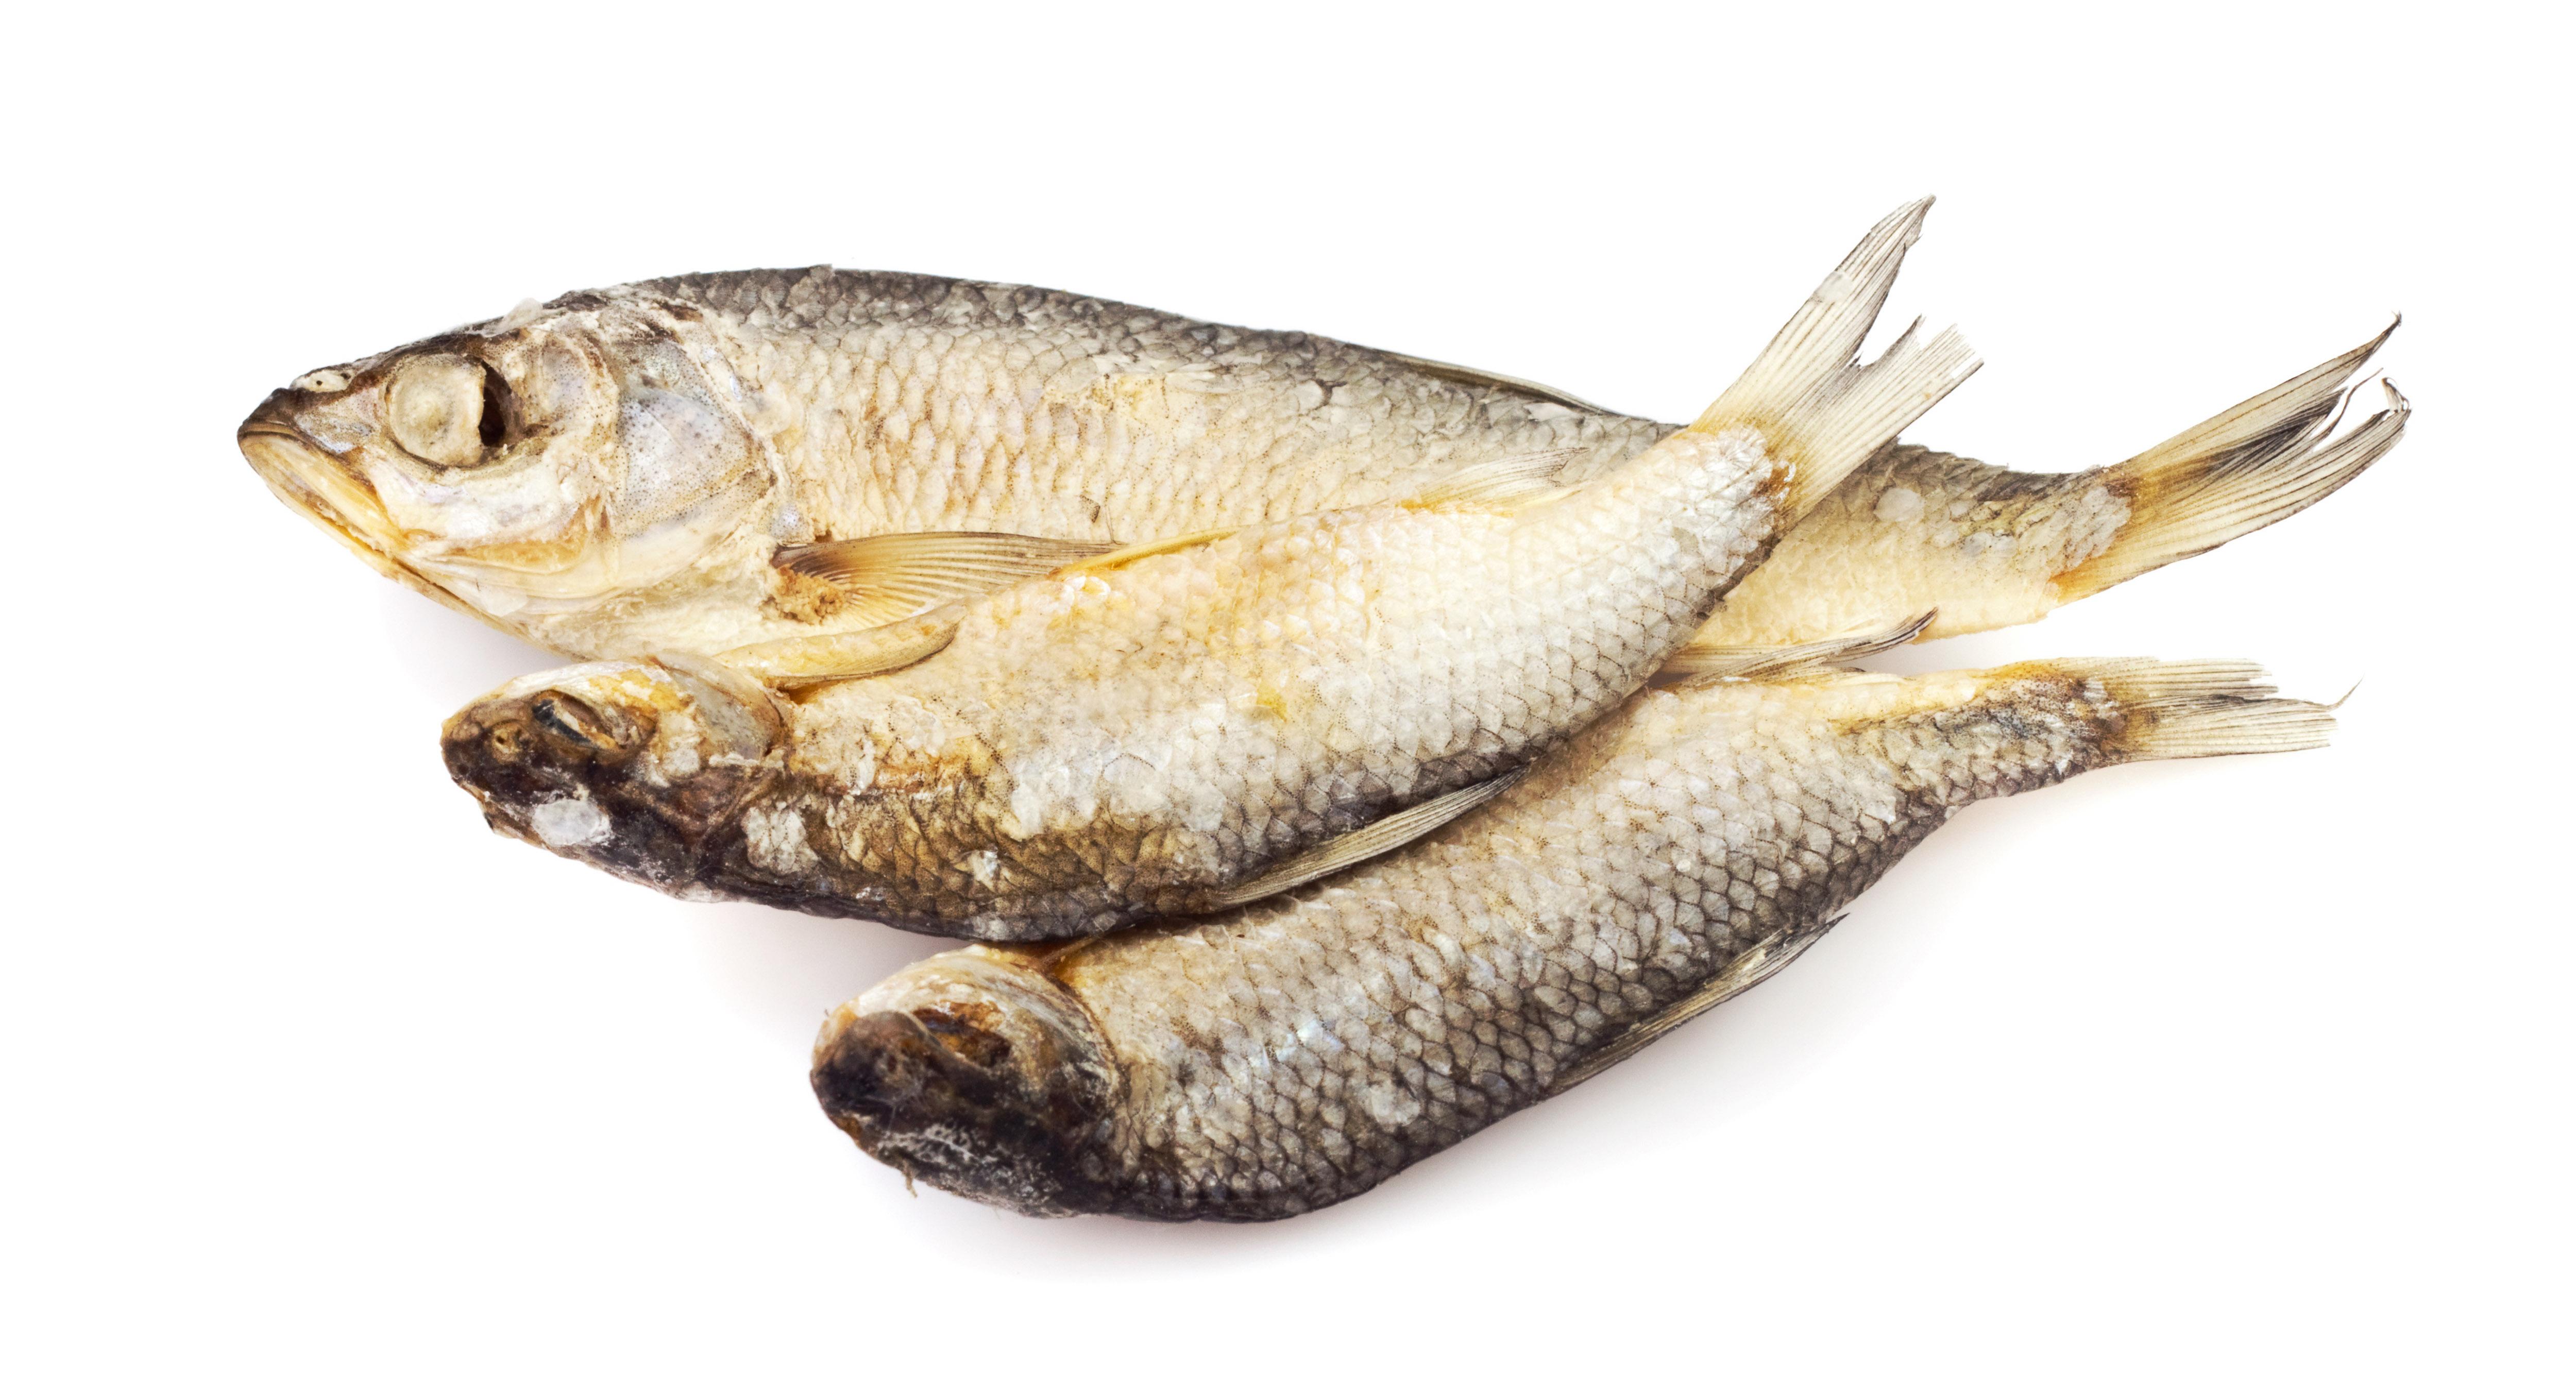 خواص ماهی را بشناسید